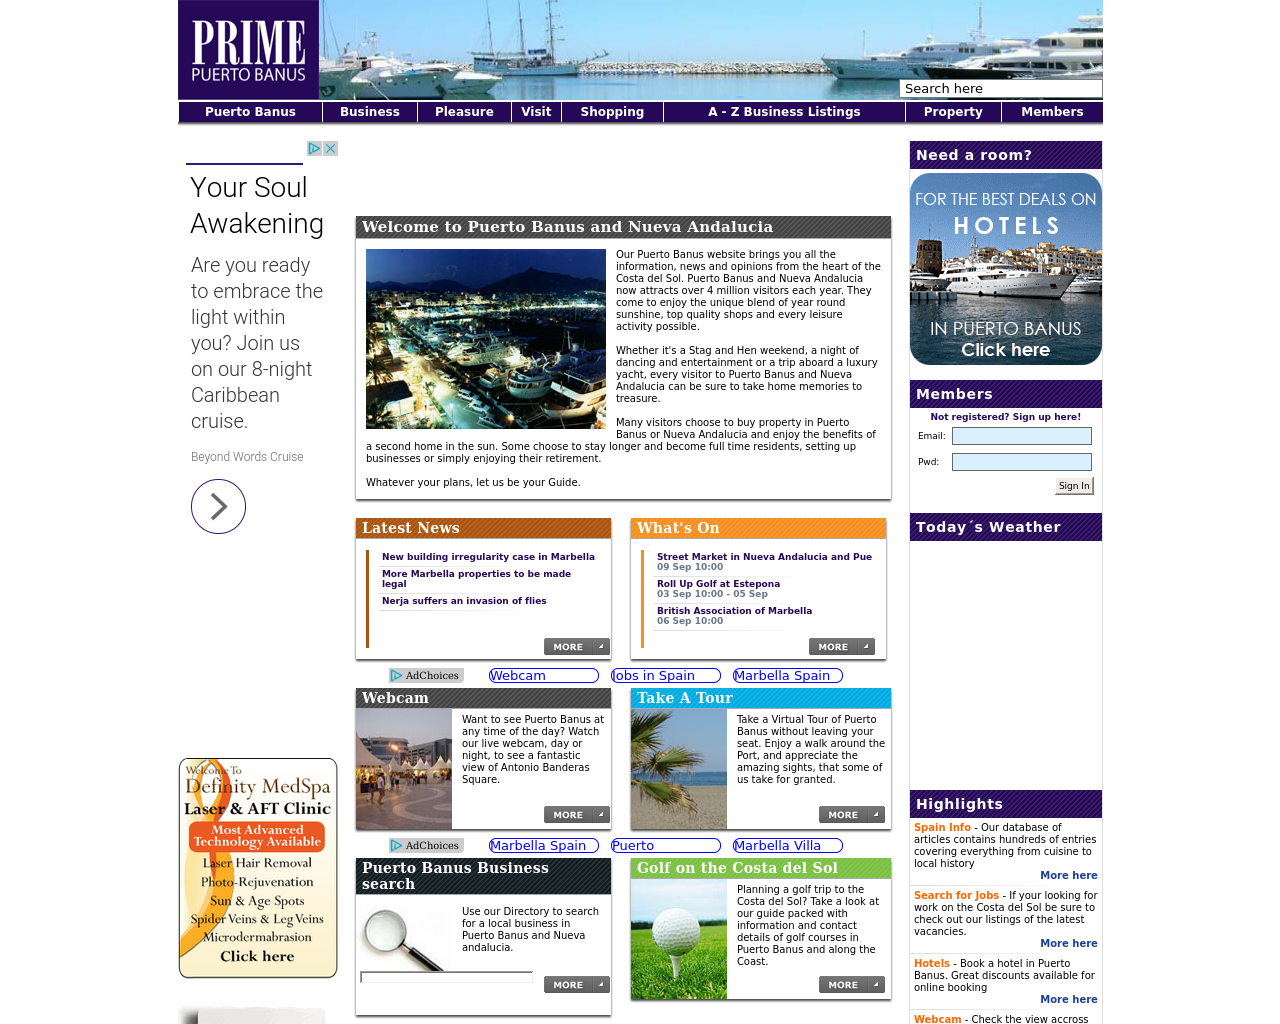 Prime-Puerto-Banus-Advertising-Reviews-Pricing